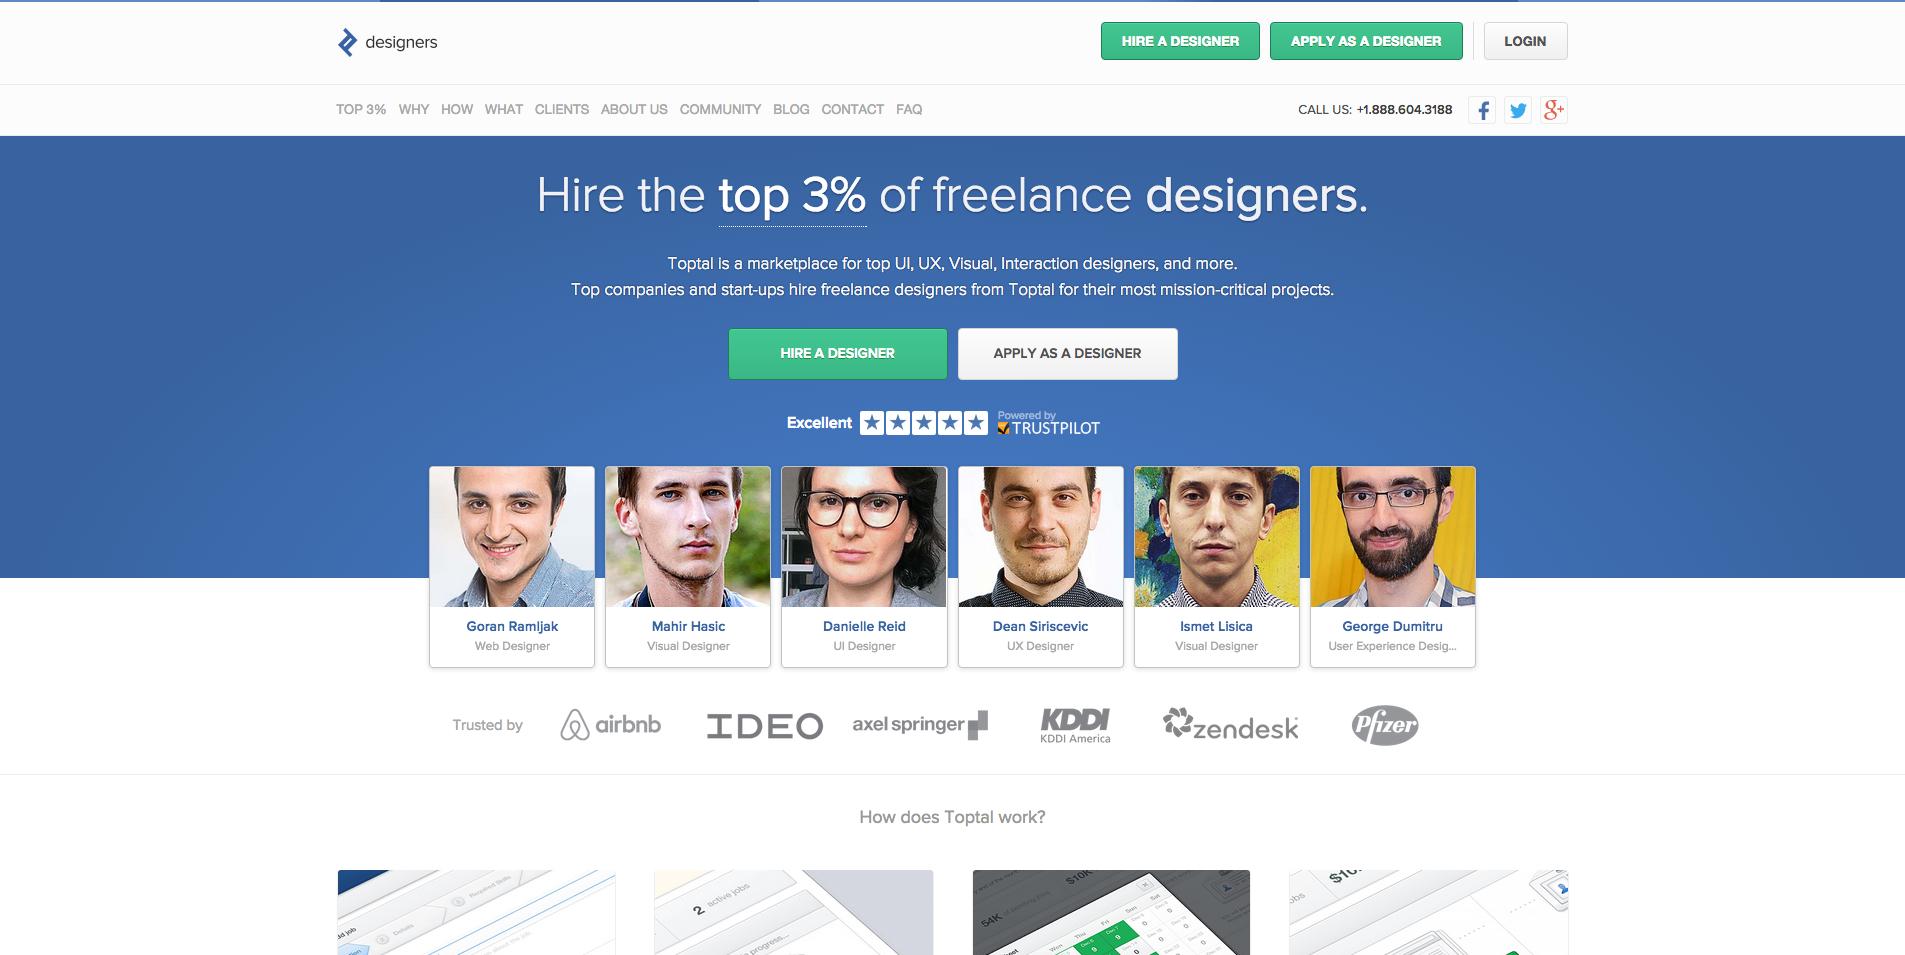 toptal designers community